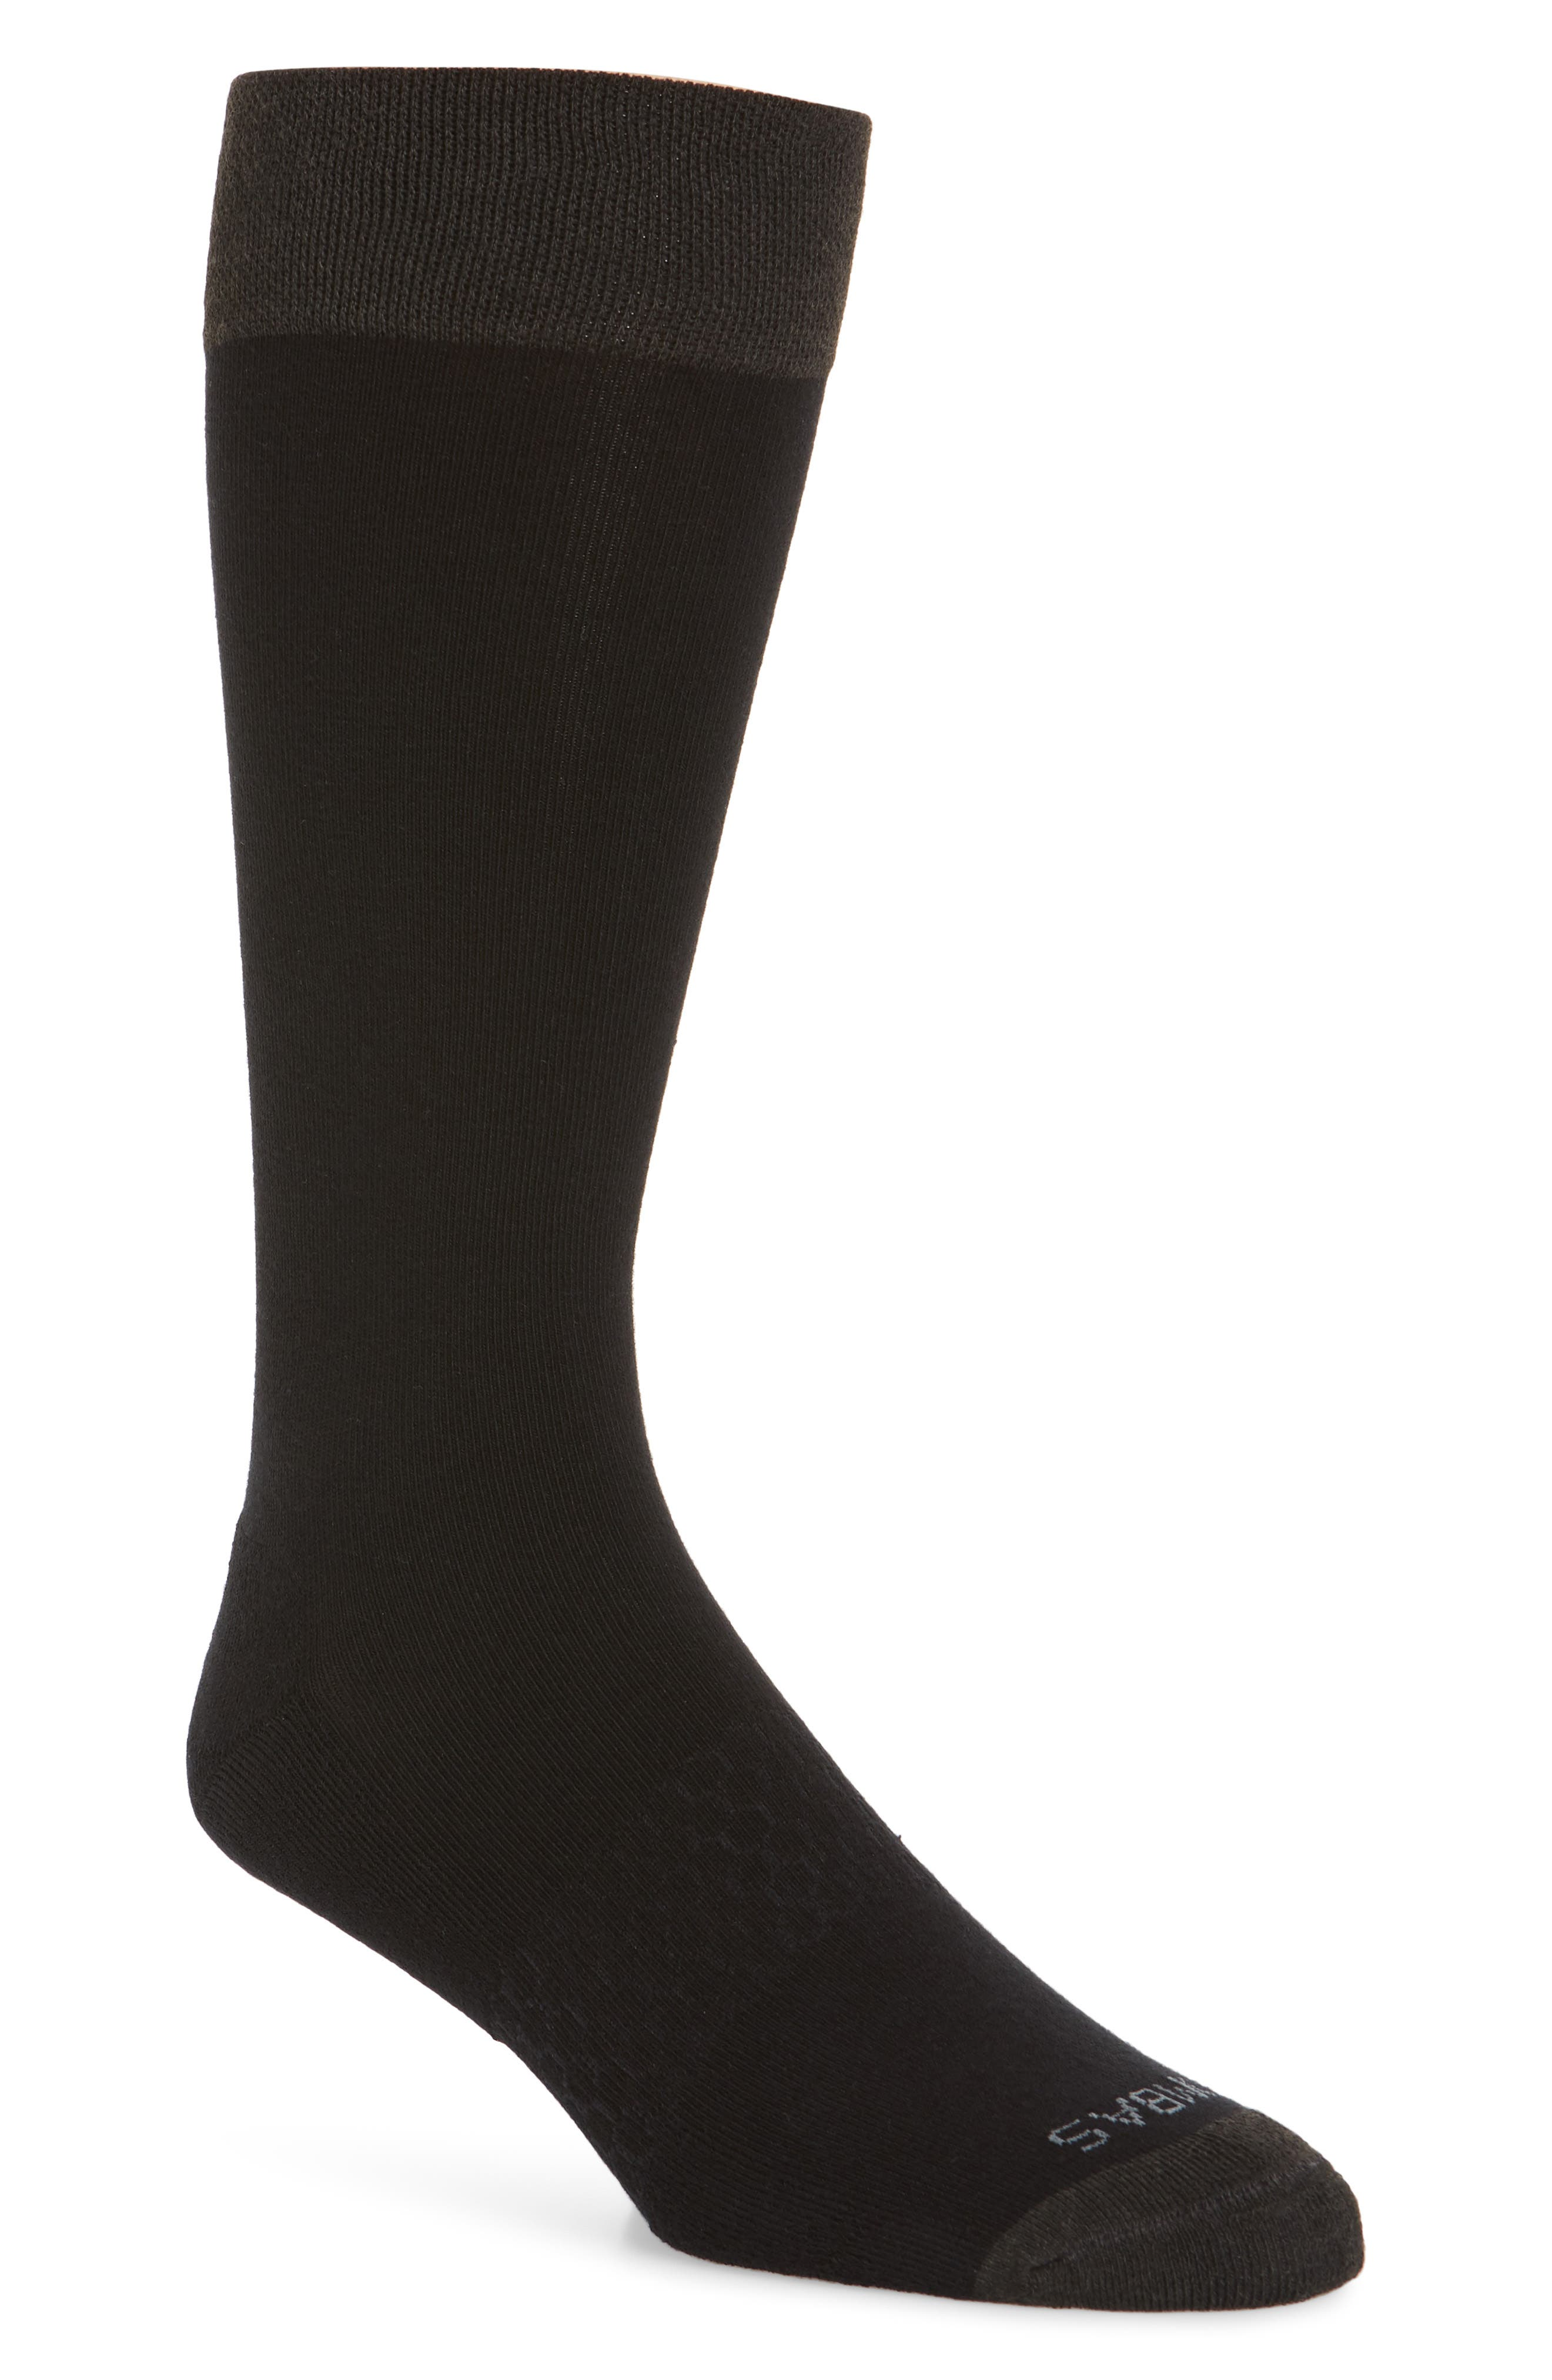 Solid Dress Socks,                         Main,                         color, 001